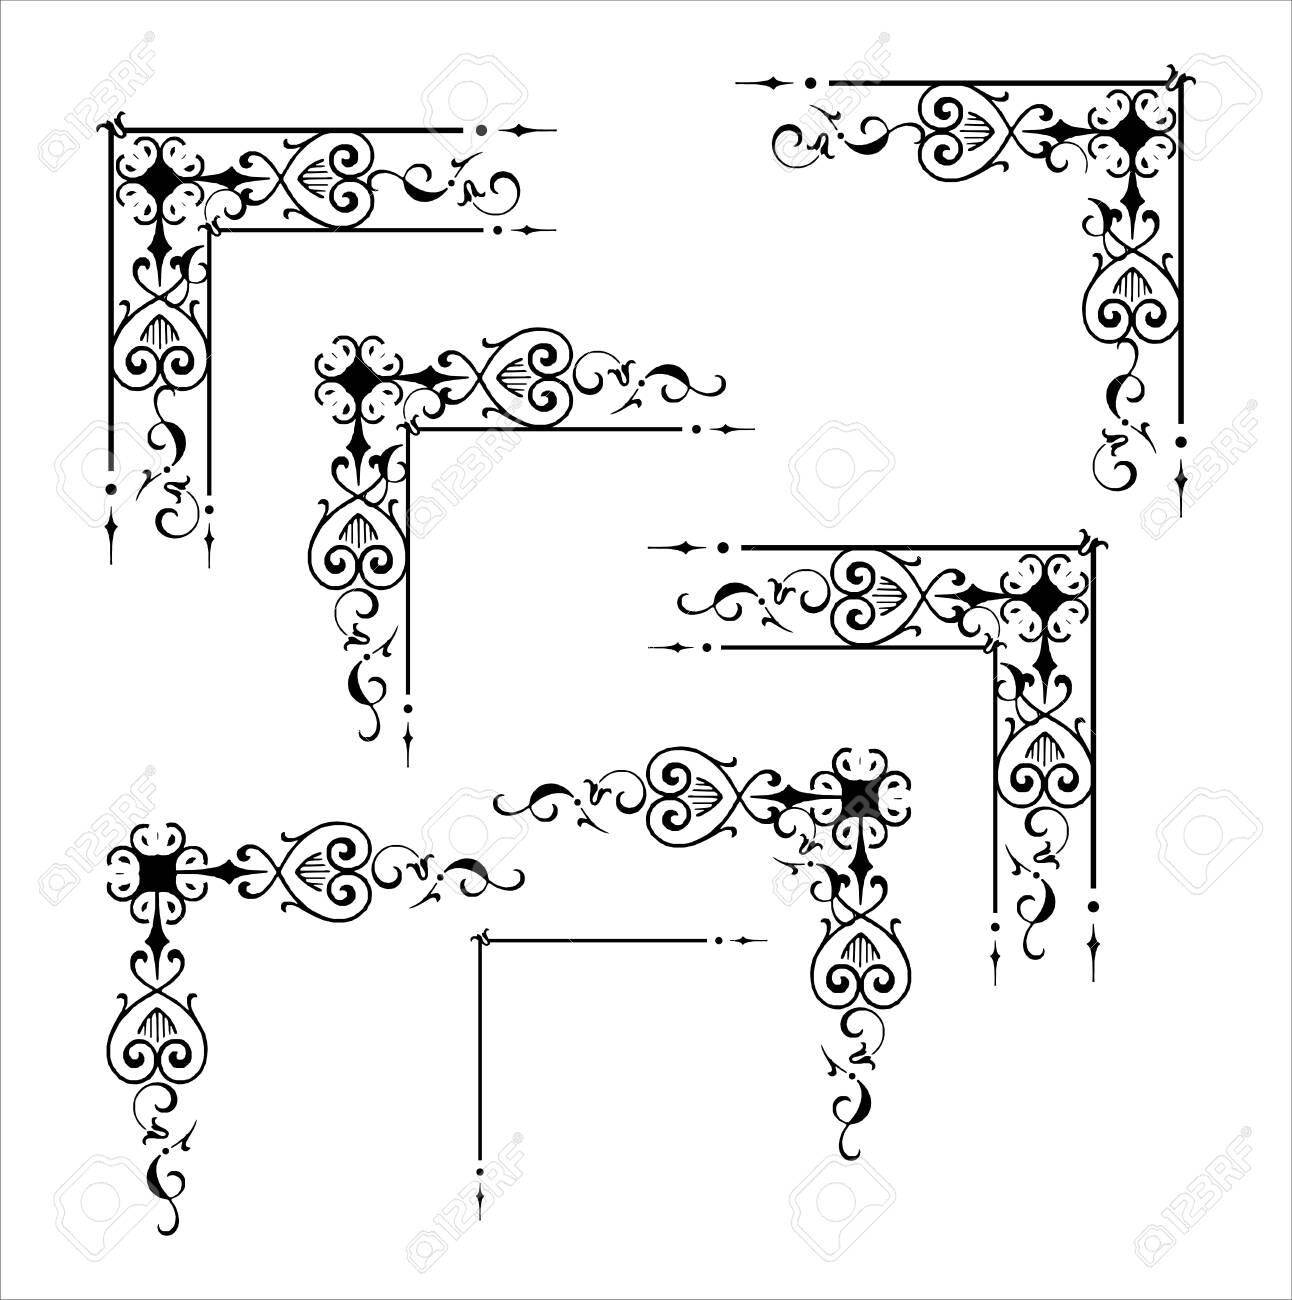 Decorative corner and frame element - 145974757